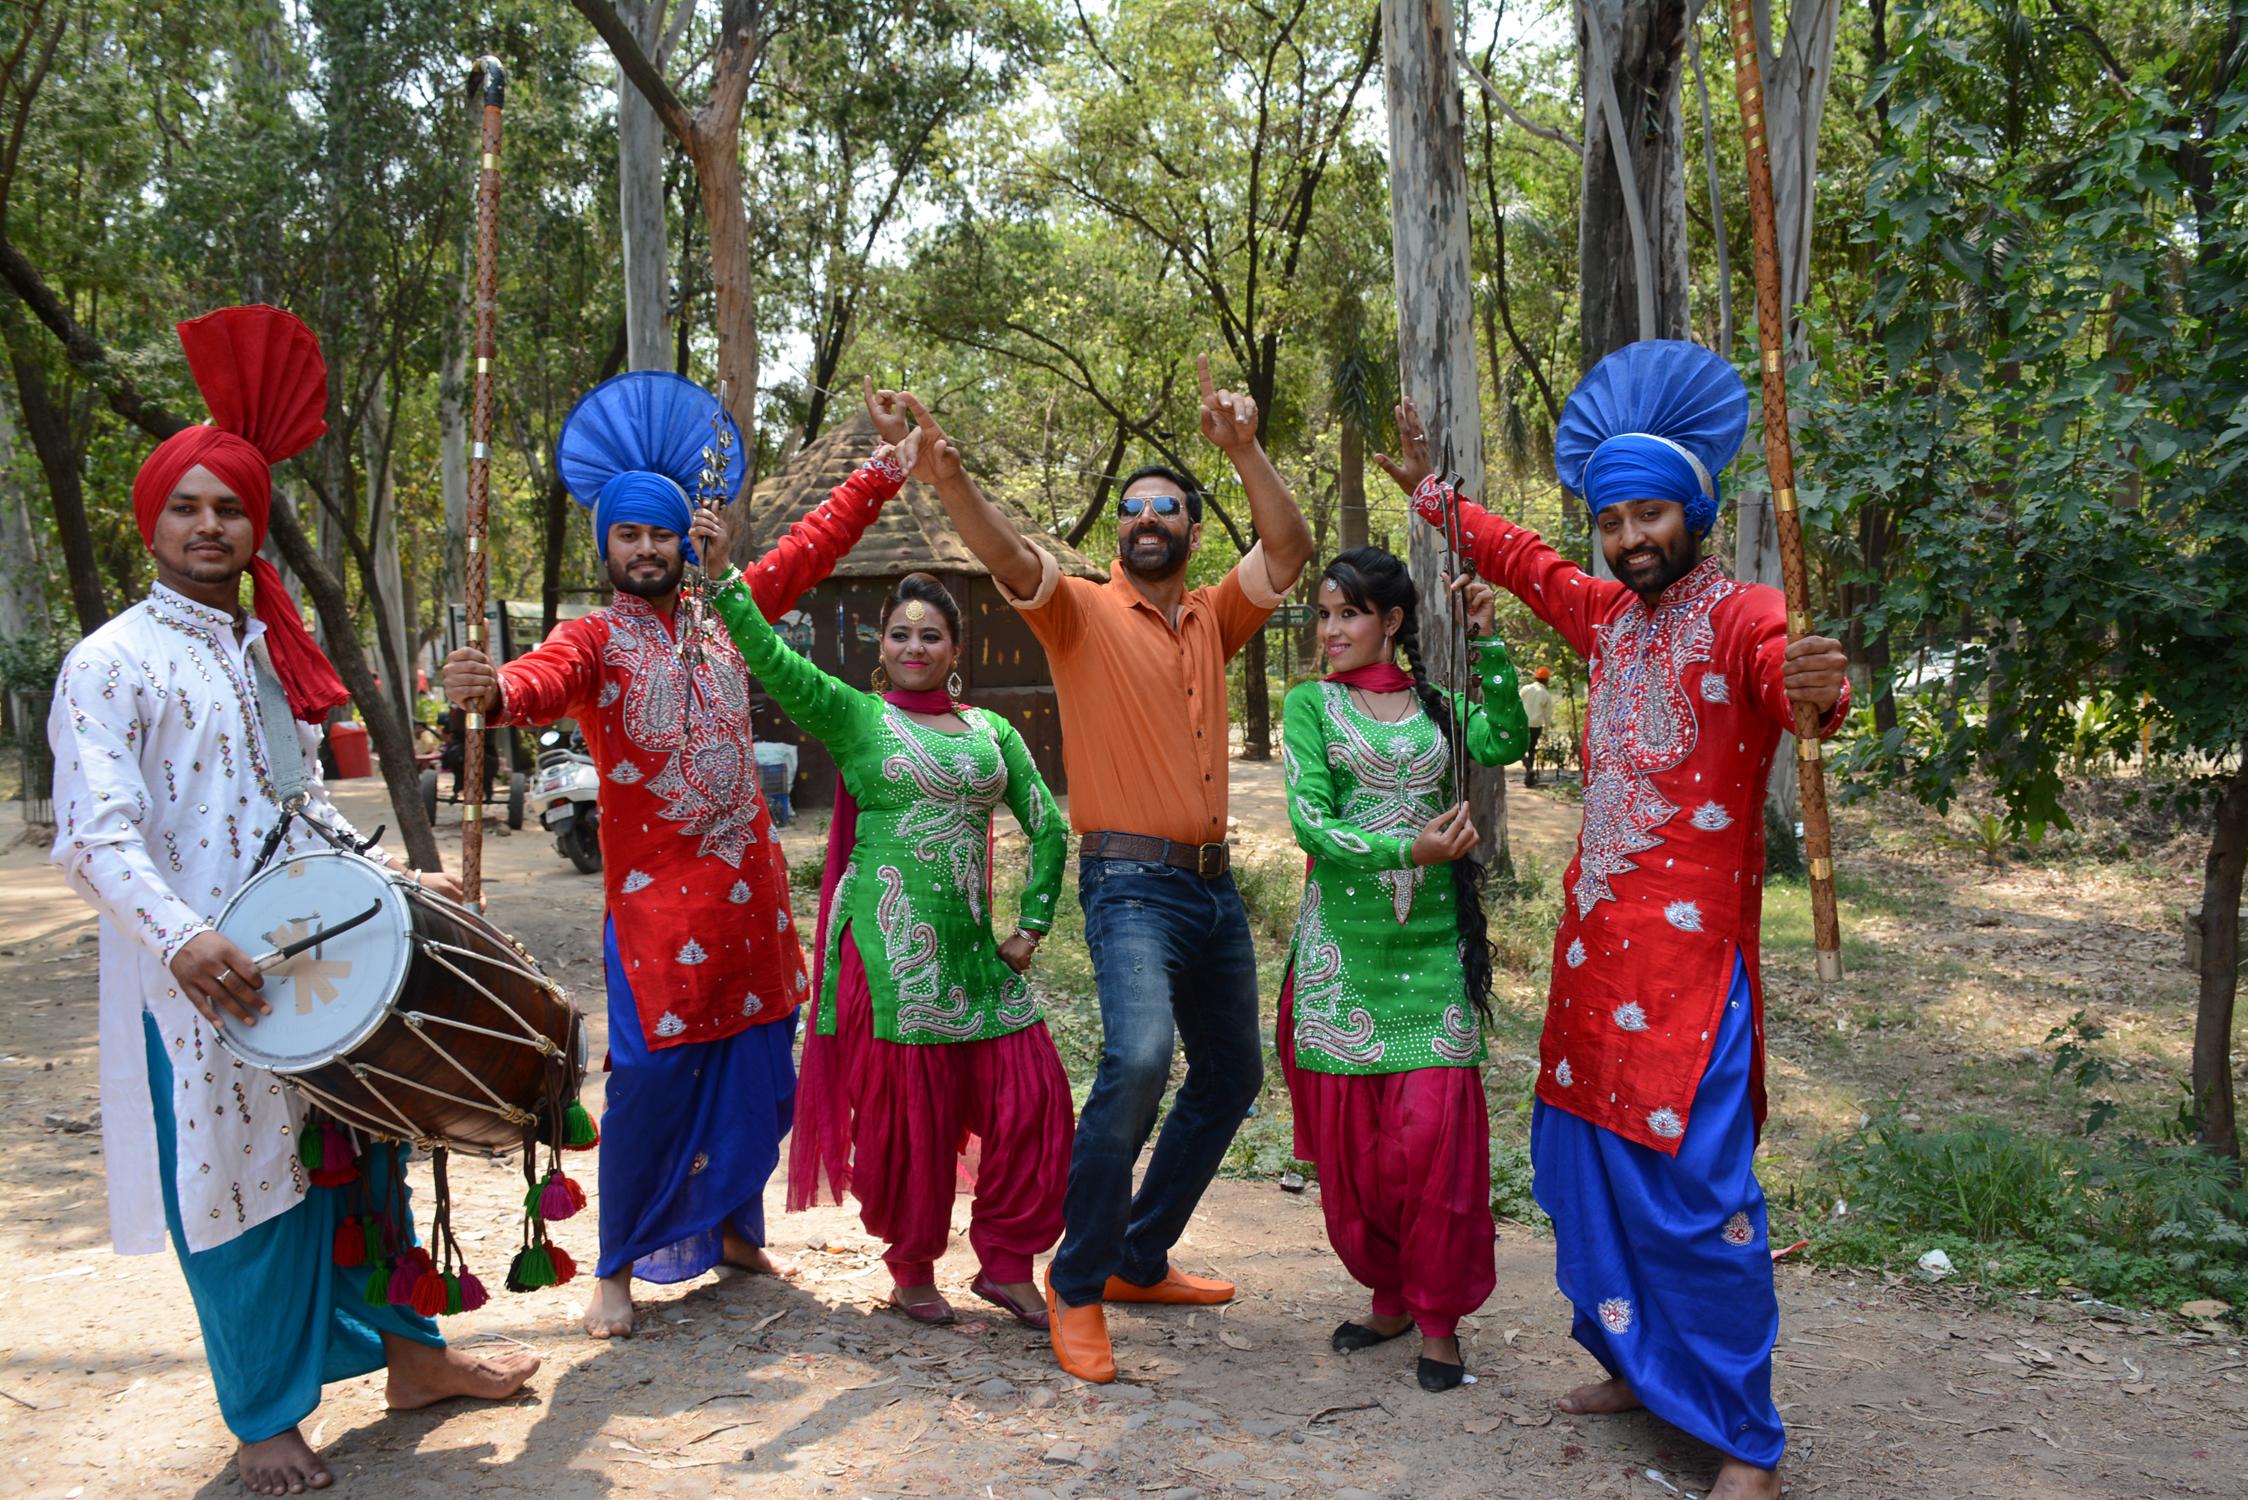 Akshay Kumar dancing